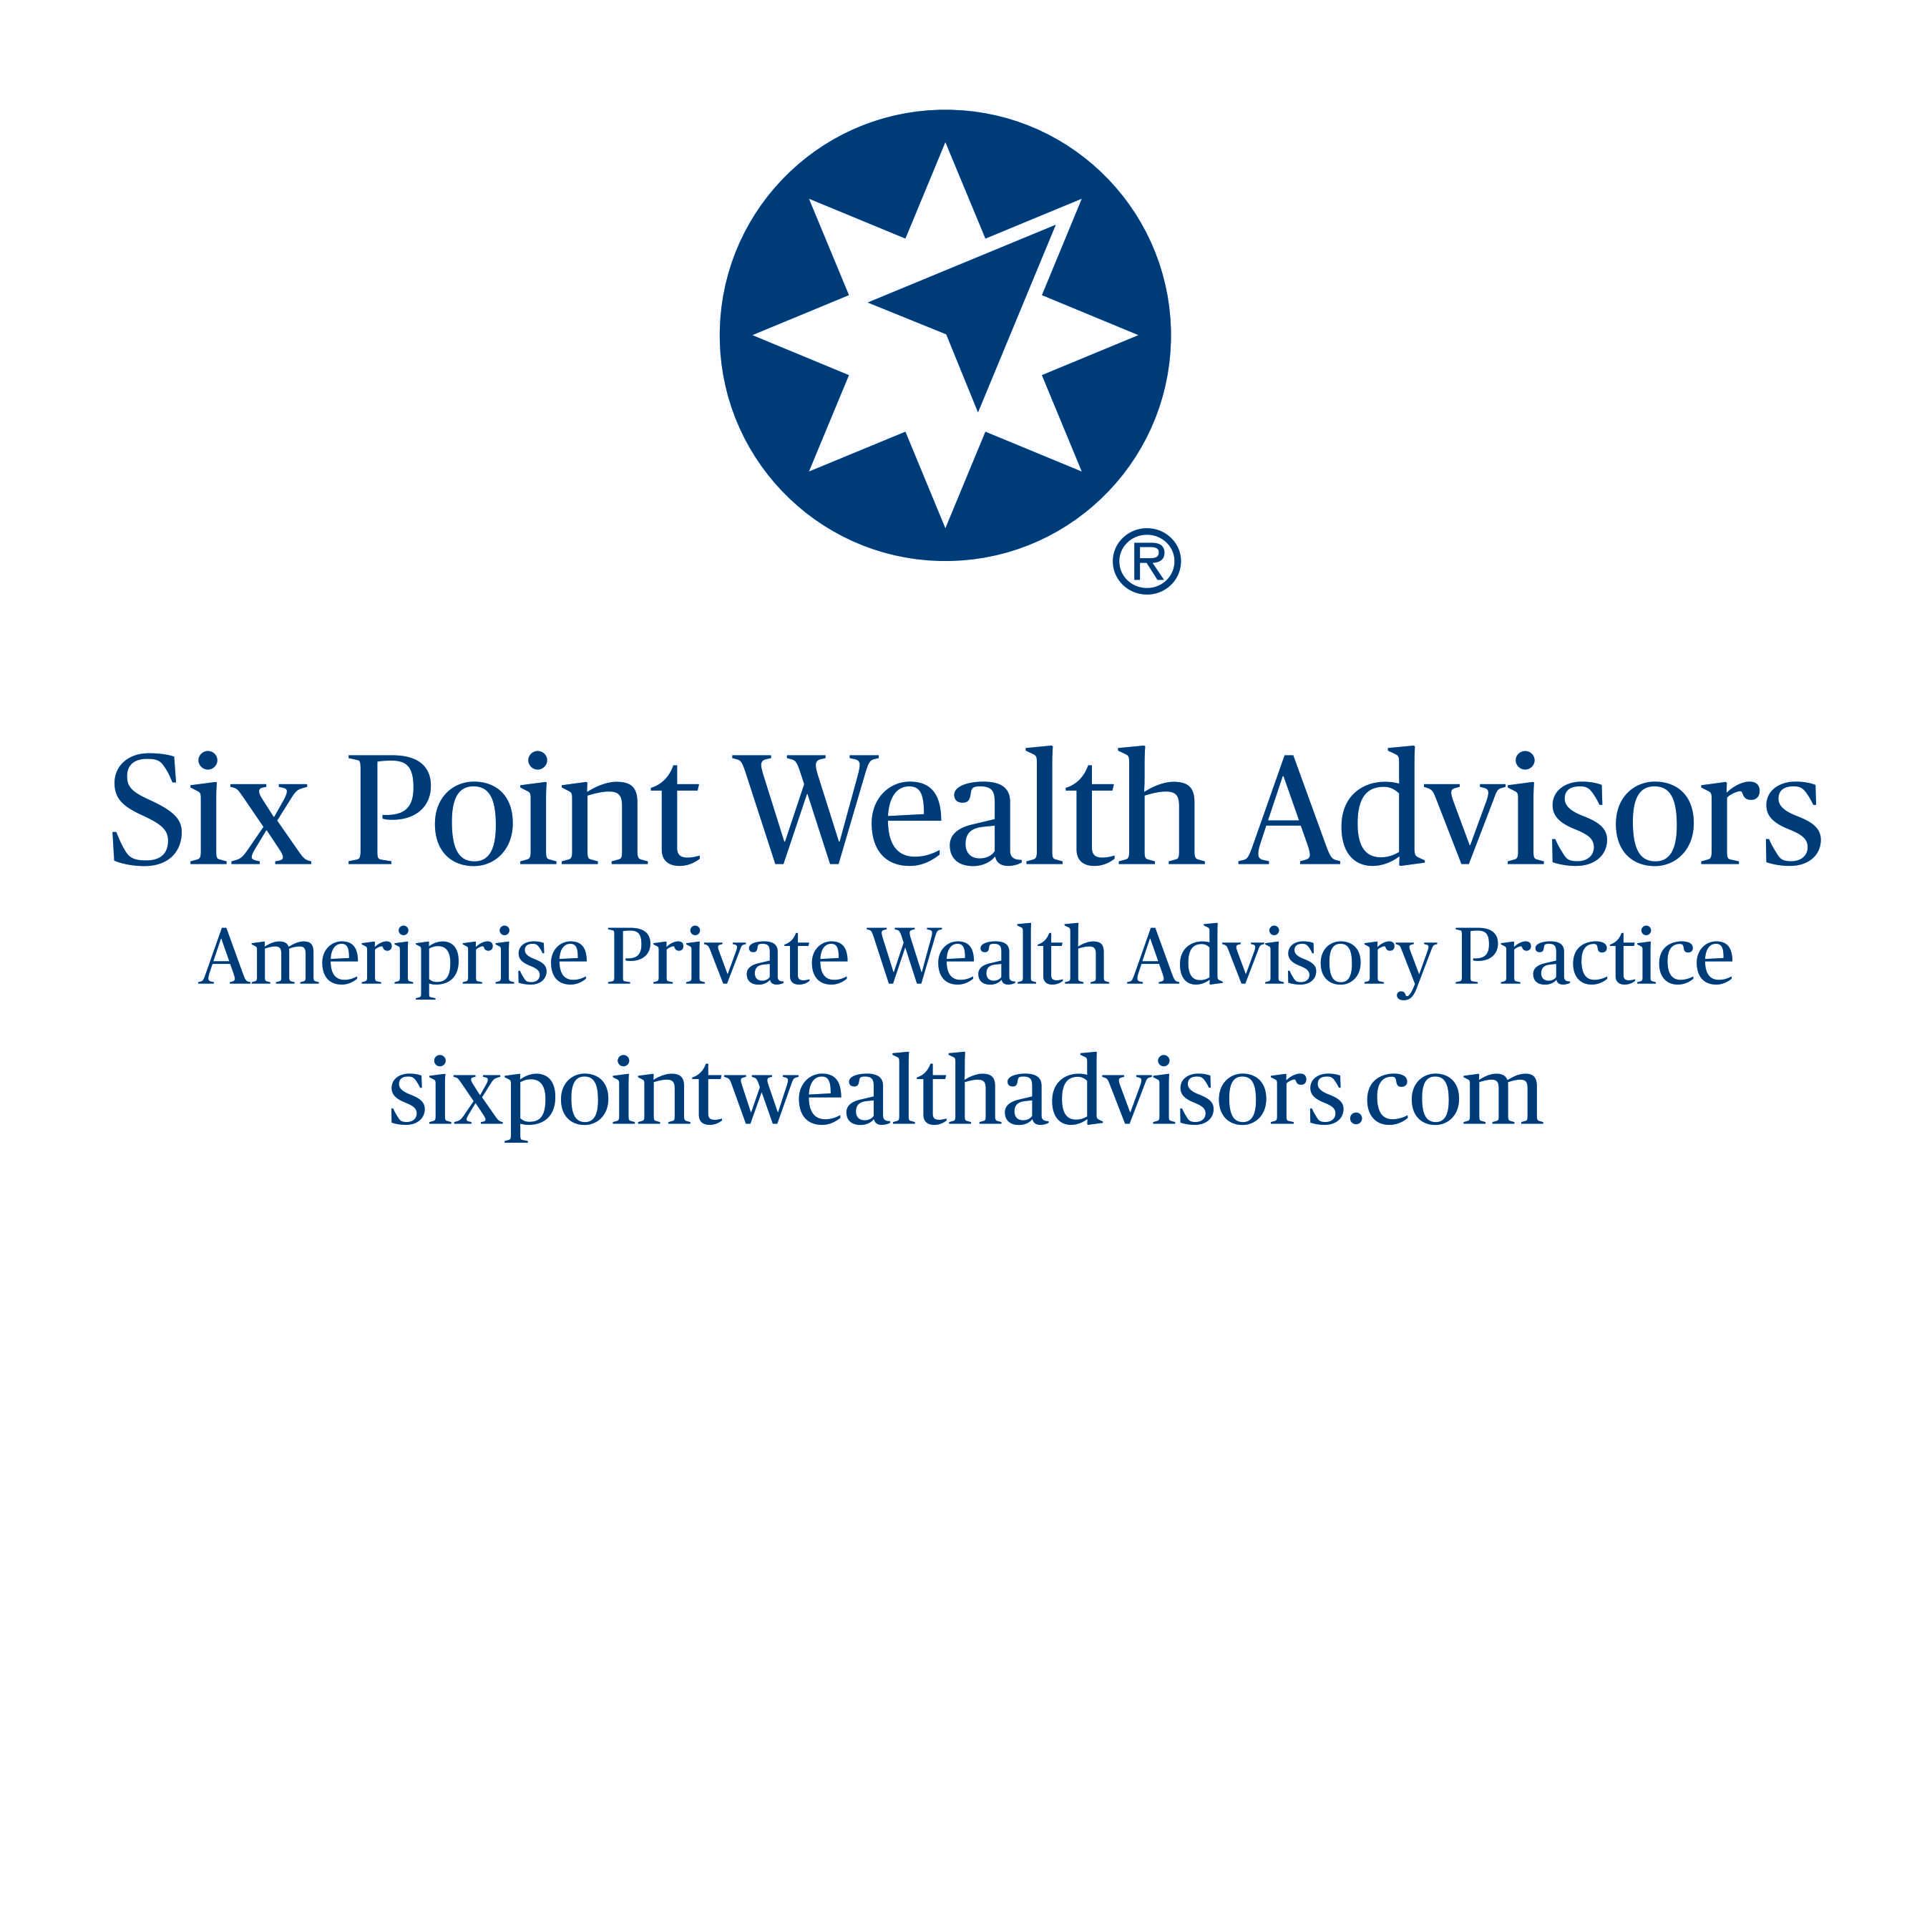 Six Point Wealth Advisors